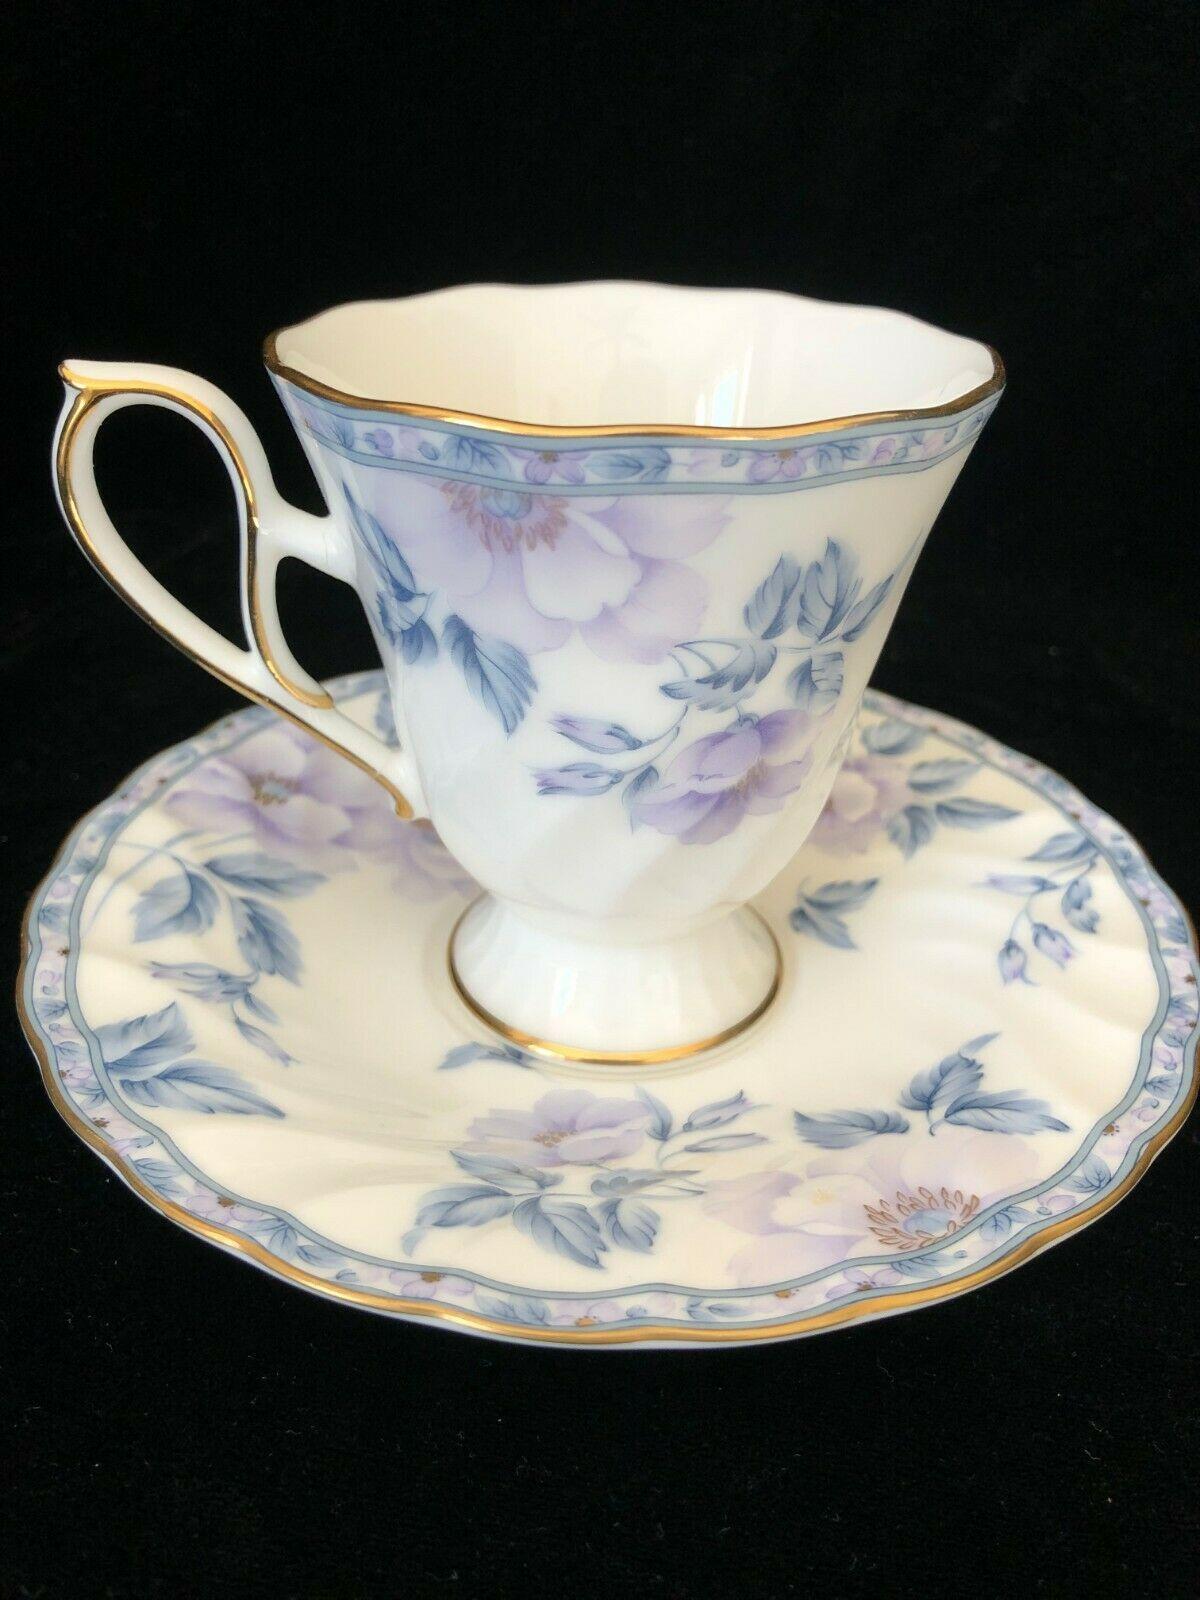 Hoya Bone China Tea Cup And Saucer With Flowers Made In Japan Ebay Bone China Tea Cups Tea Cups Tea